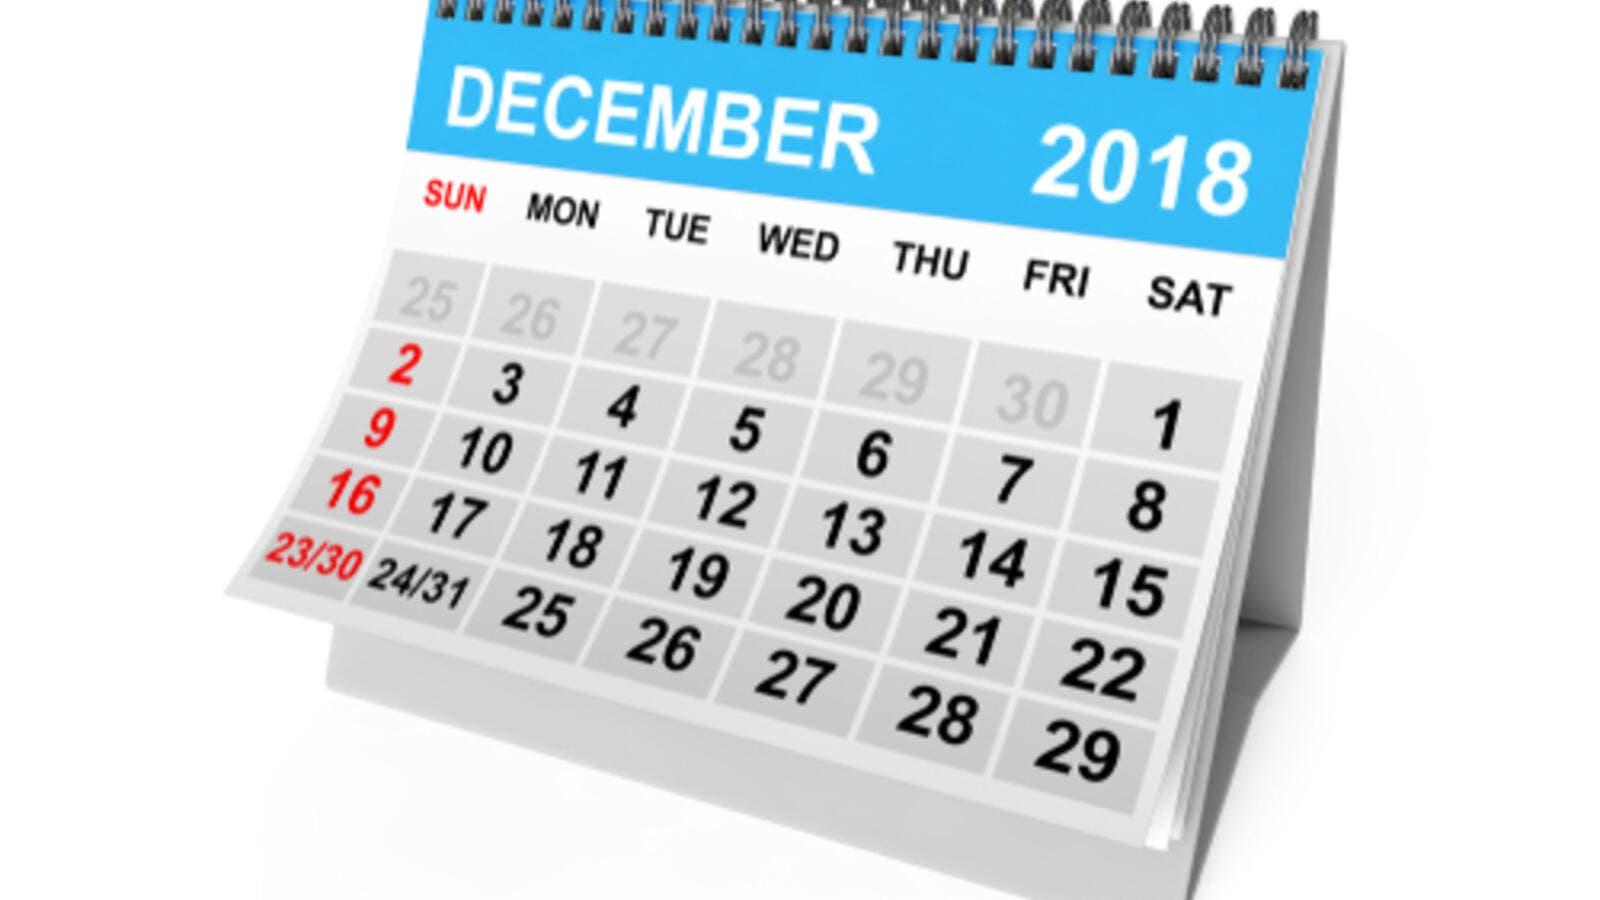 54d6b0adc623b توقعات الأبراج لشهر كانون الأول  ديسمبر 2018 من ماغي فرح